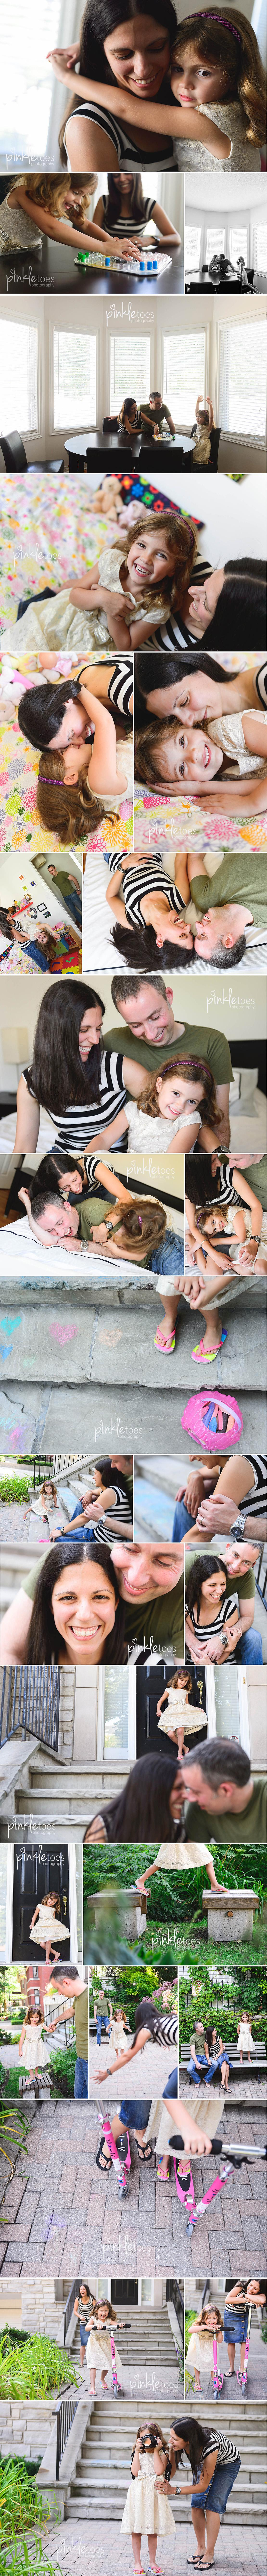 ta-pinkle-toes-austin-family-lifestyle-photography-workshop-california-seattle-sandiego-santarosa-sydney-perth-australia